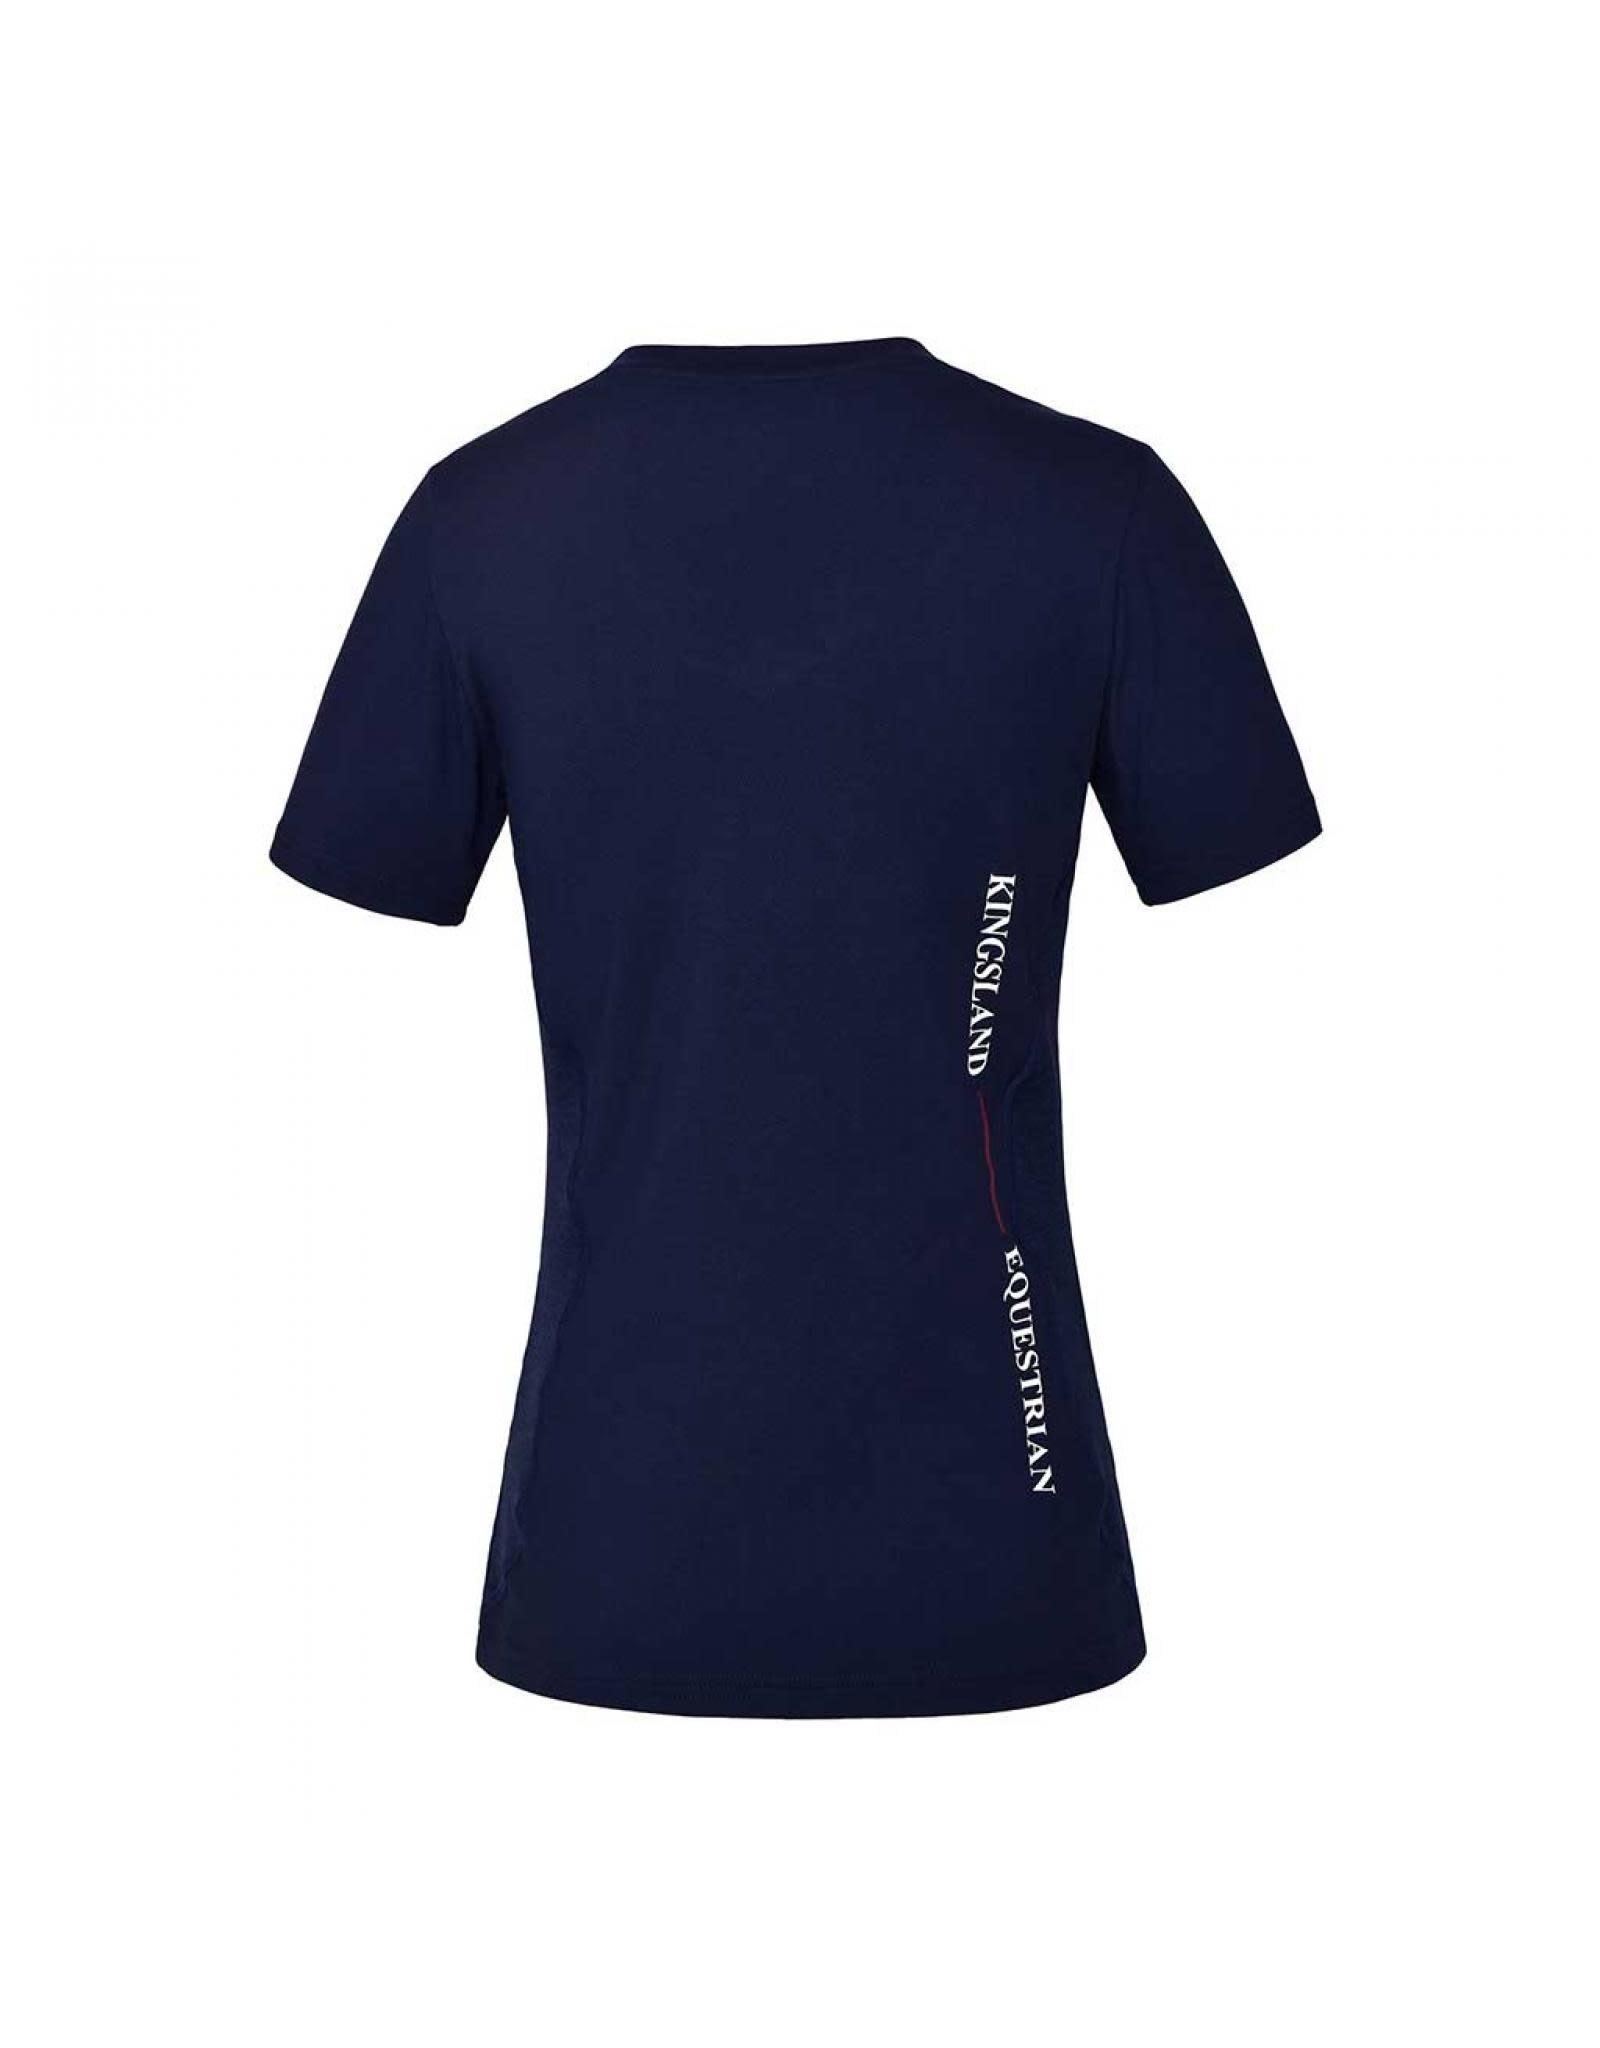 Kingsland KL Jaslyn shirt Navy